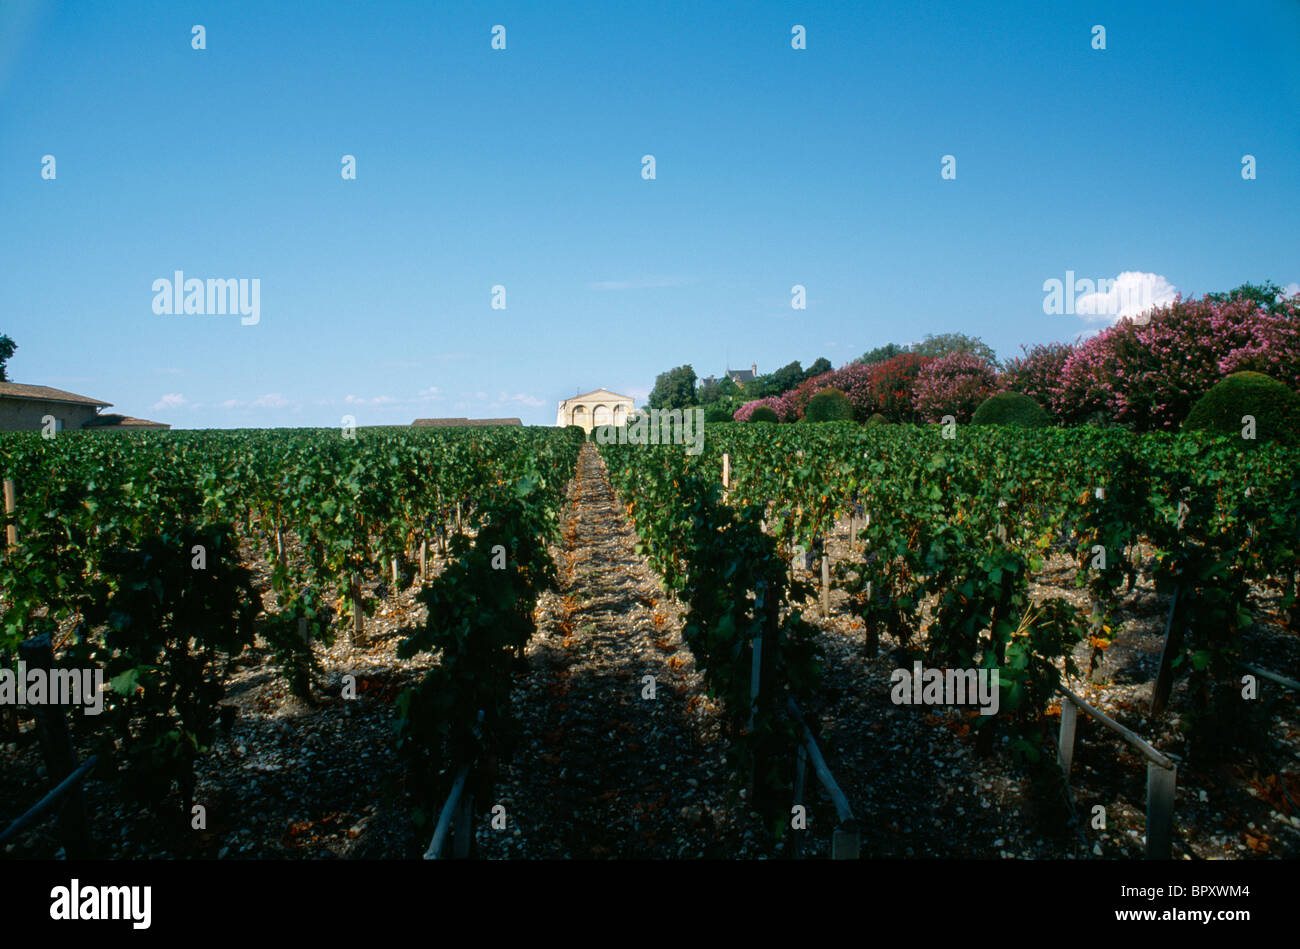 Pauillac France Chateau Mouton Rothschild & Vineyard - Stock Image